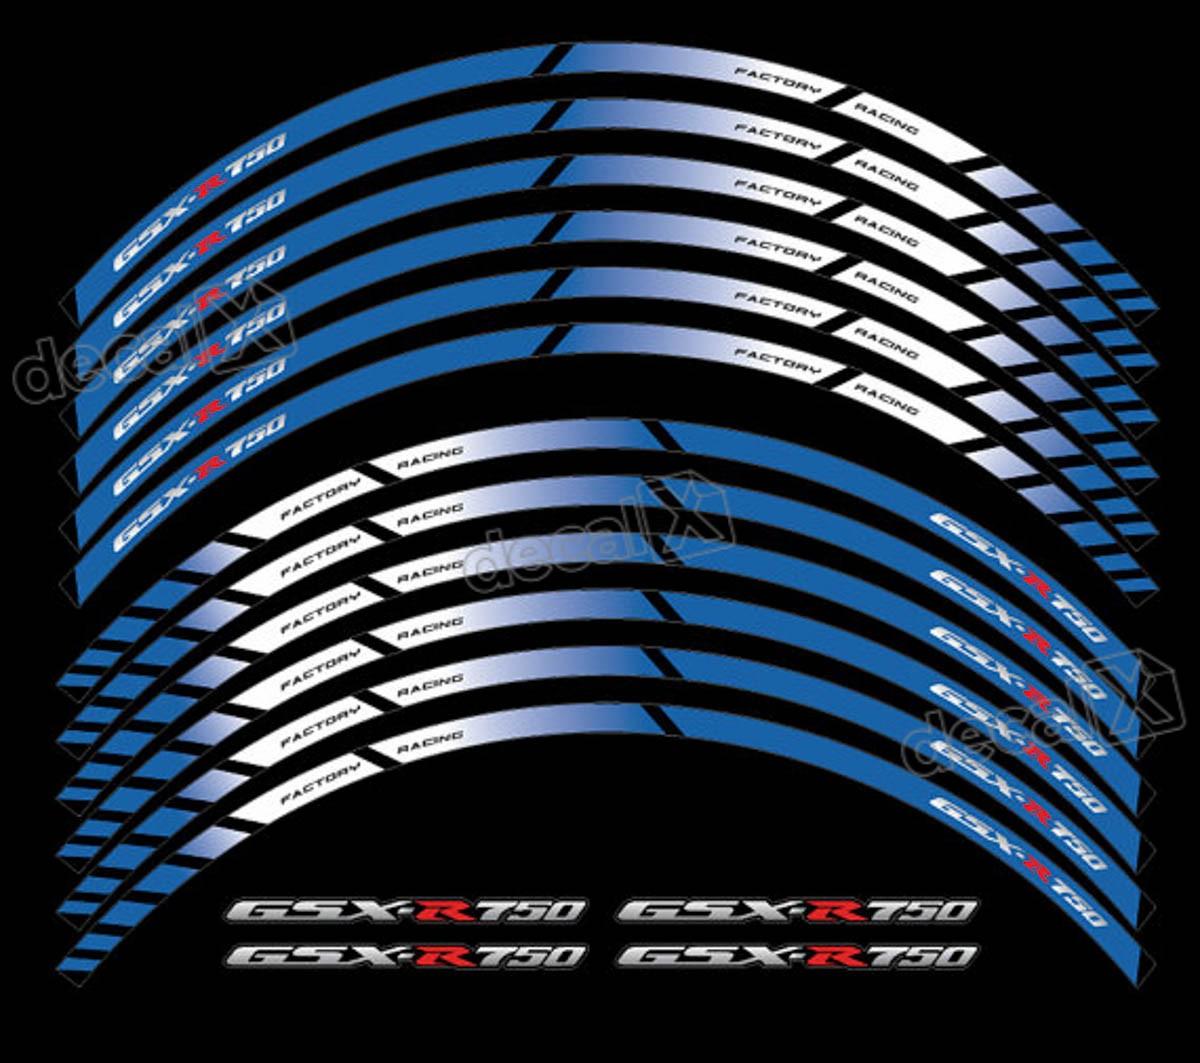 Armario De Parede Pequeno ~ Kit Adesivo Friso Refletivo Roda Moto Suzuki Gsxr 750 Fri48 Adesivos para motos& Adesivos